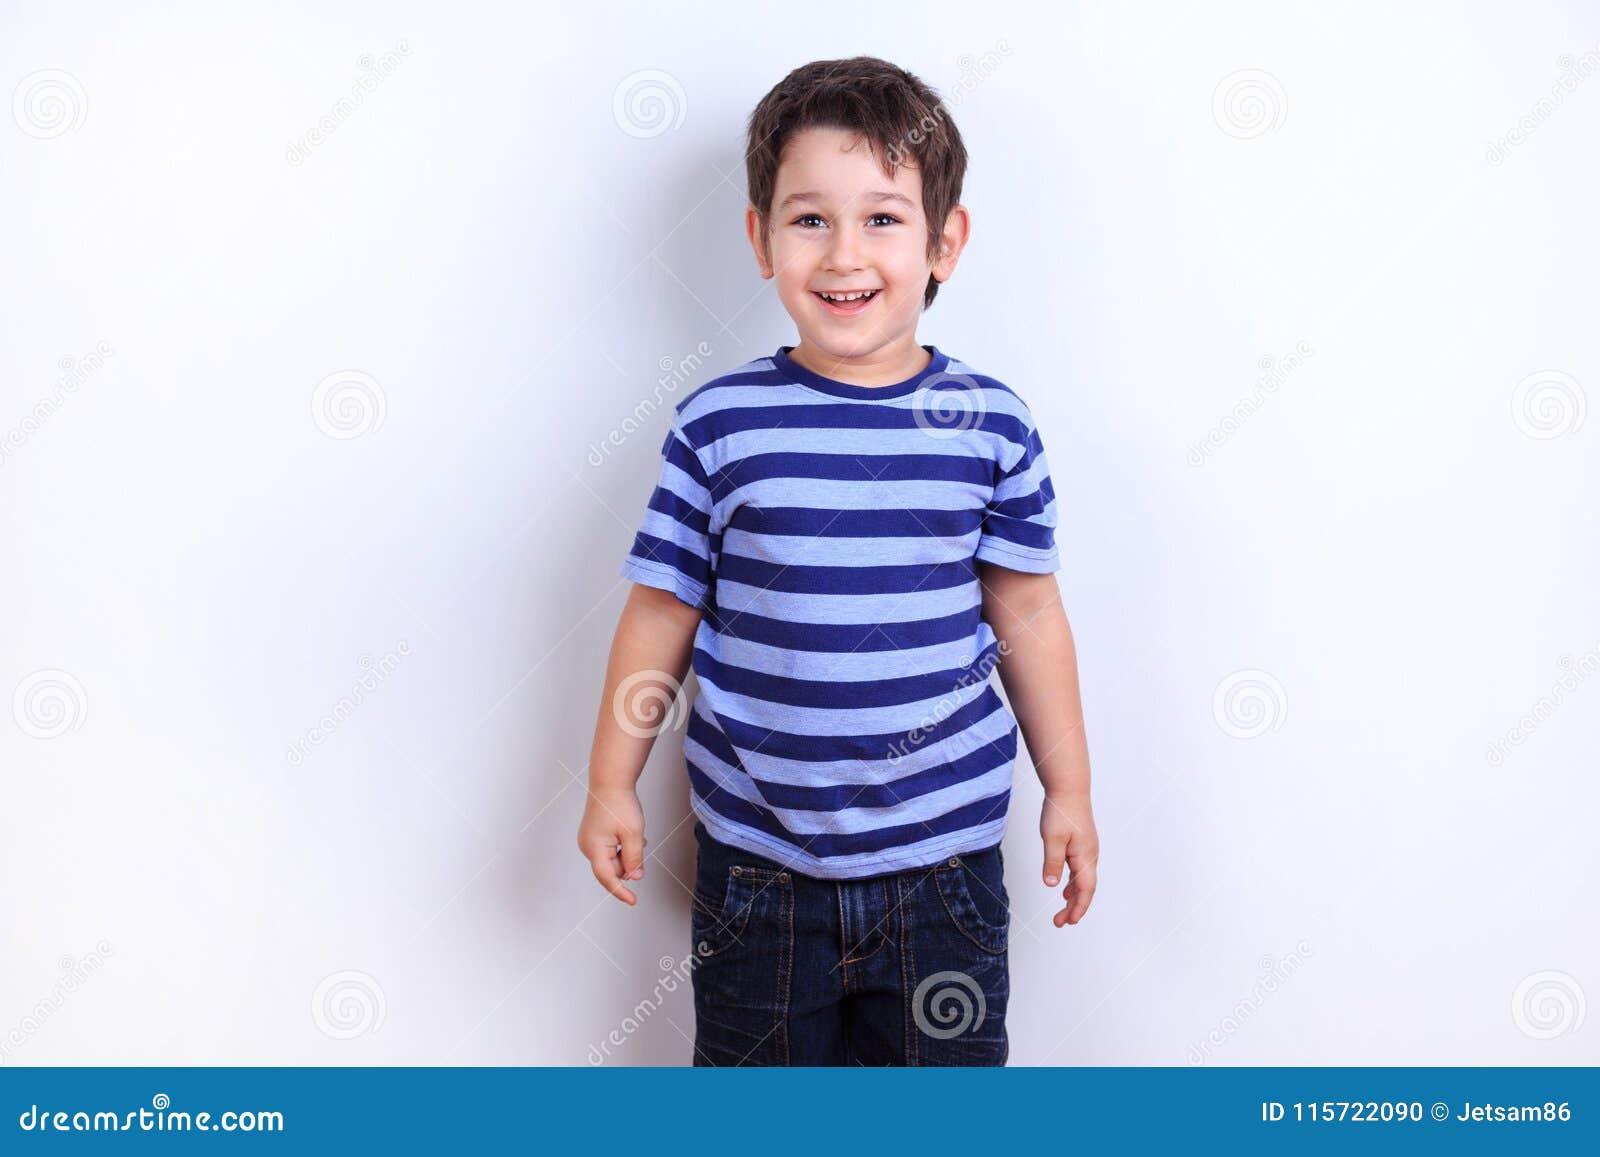 Little lovely boy laughing, studio shoot on white. Emotions, fee